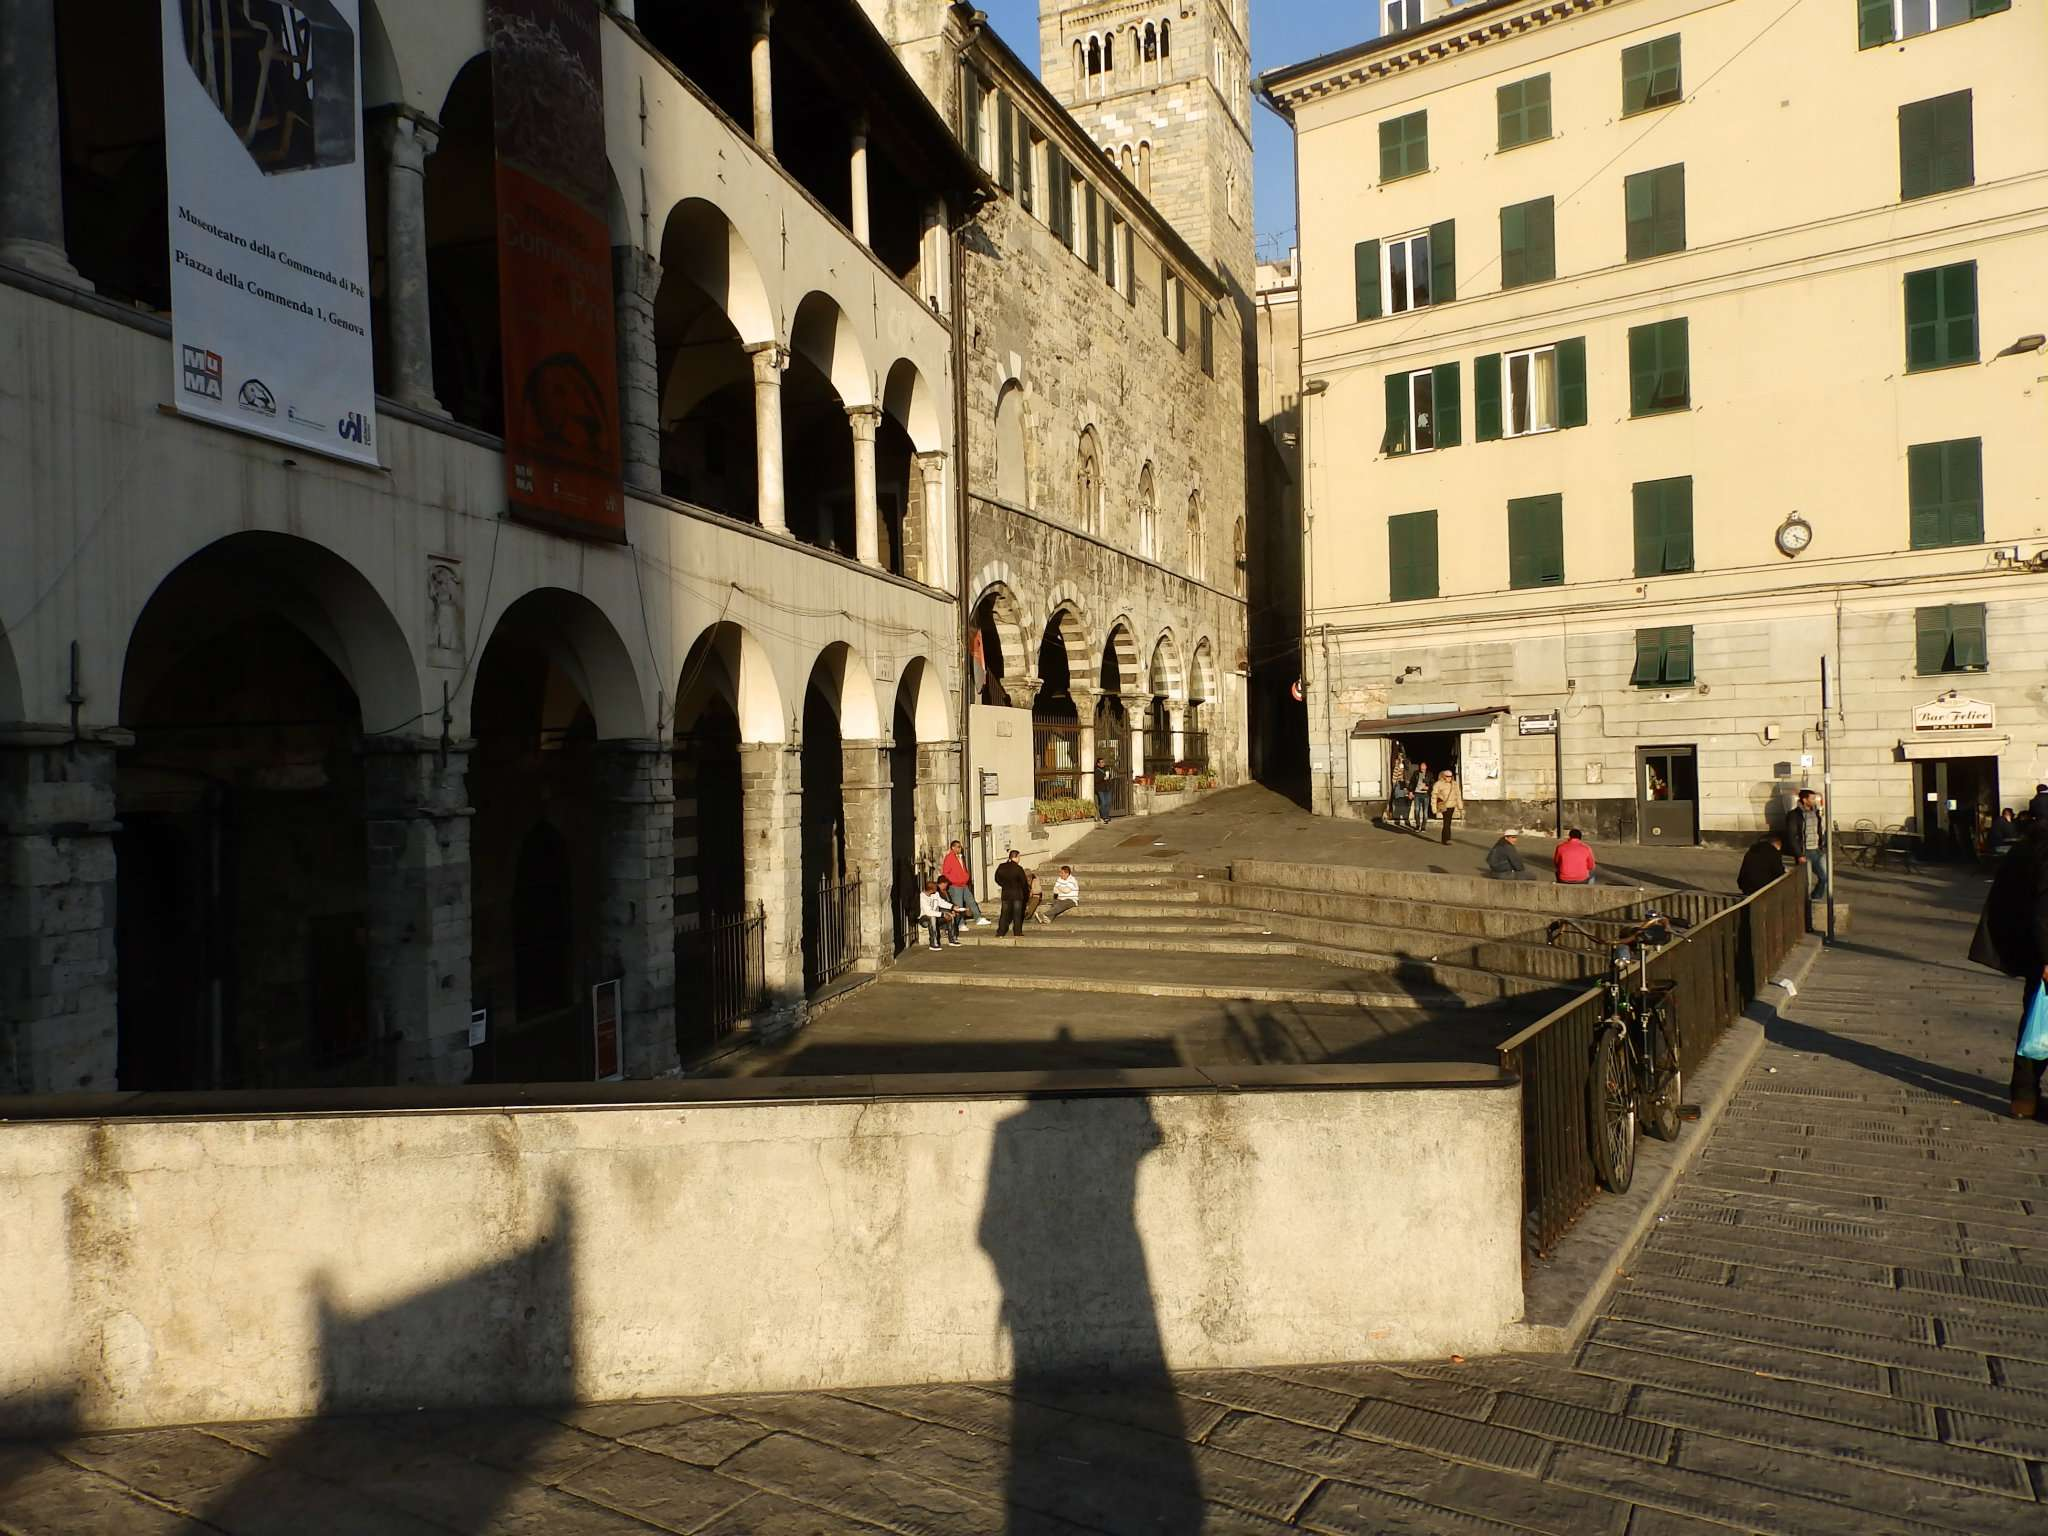 Bilocale Genova Salita San Paolo 4